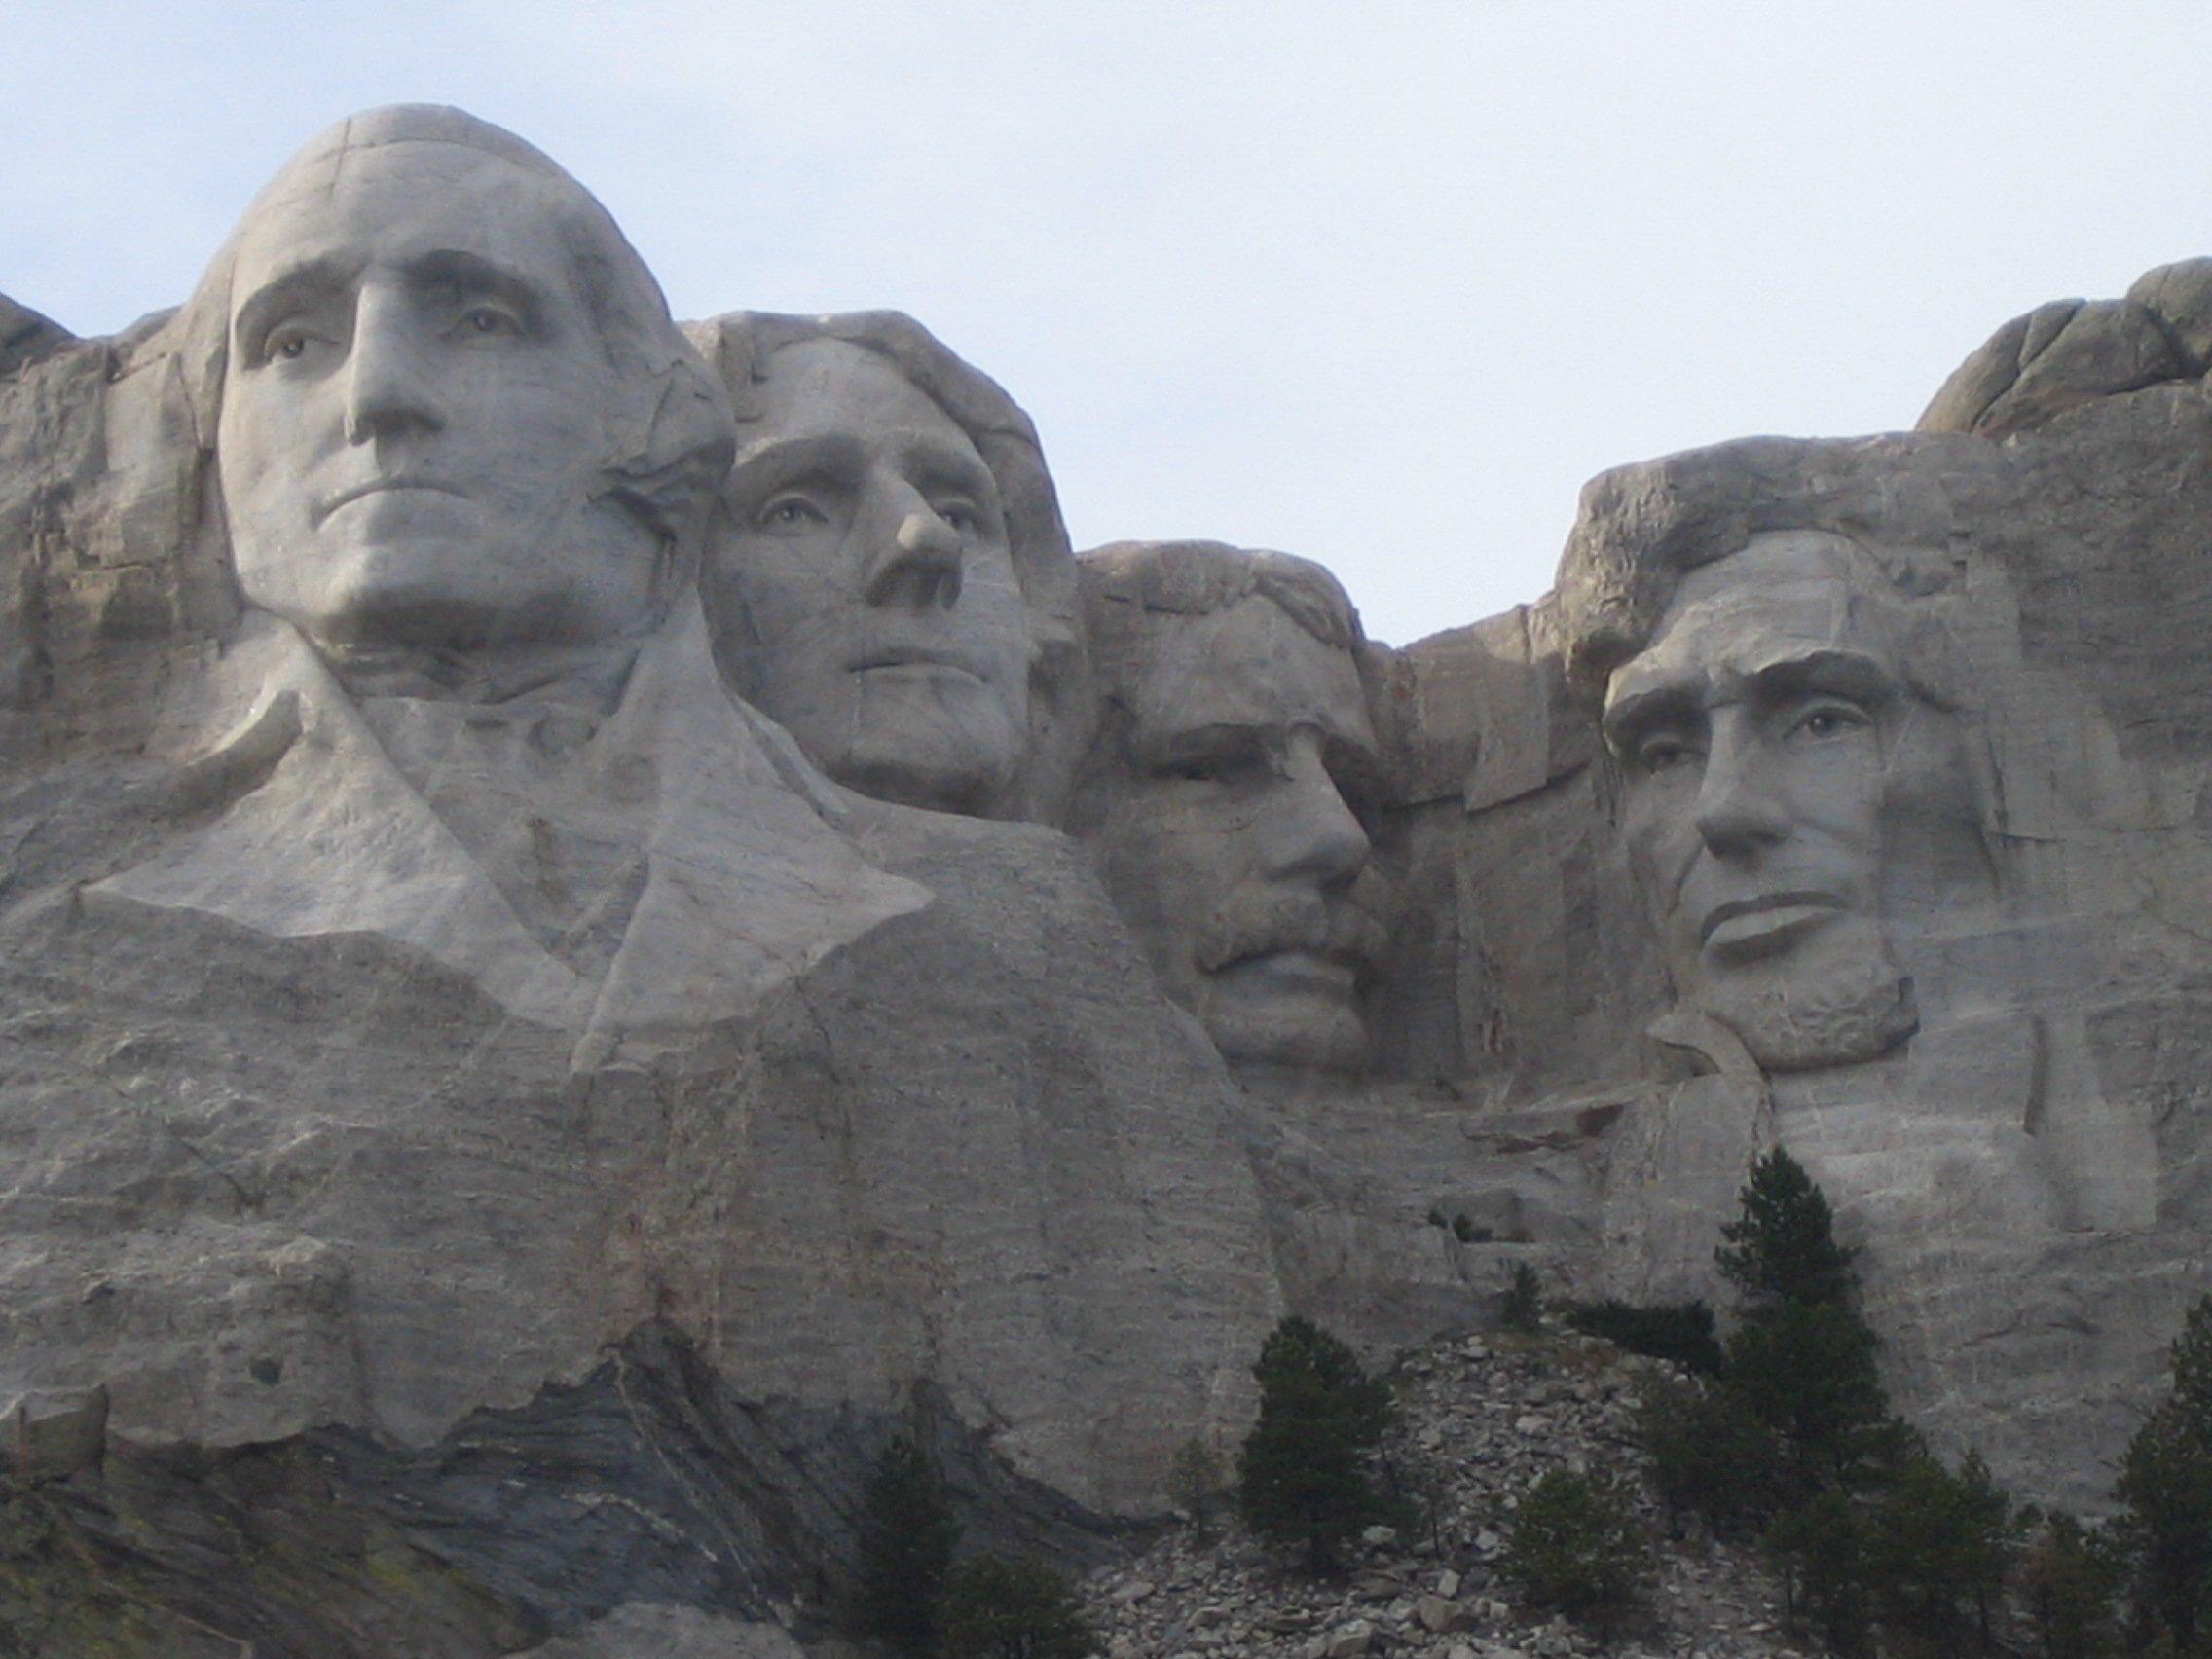 Mount Rushmore as public art?